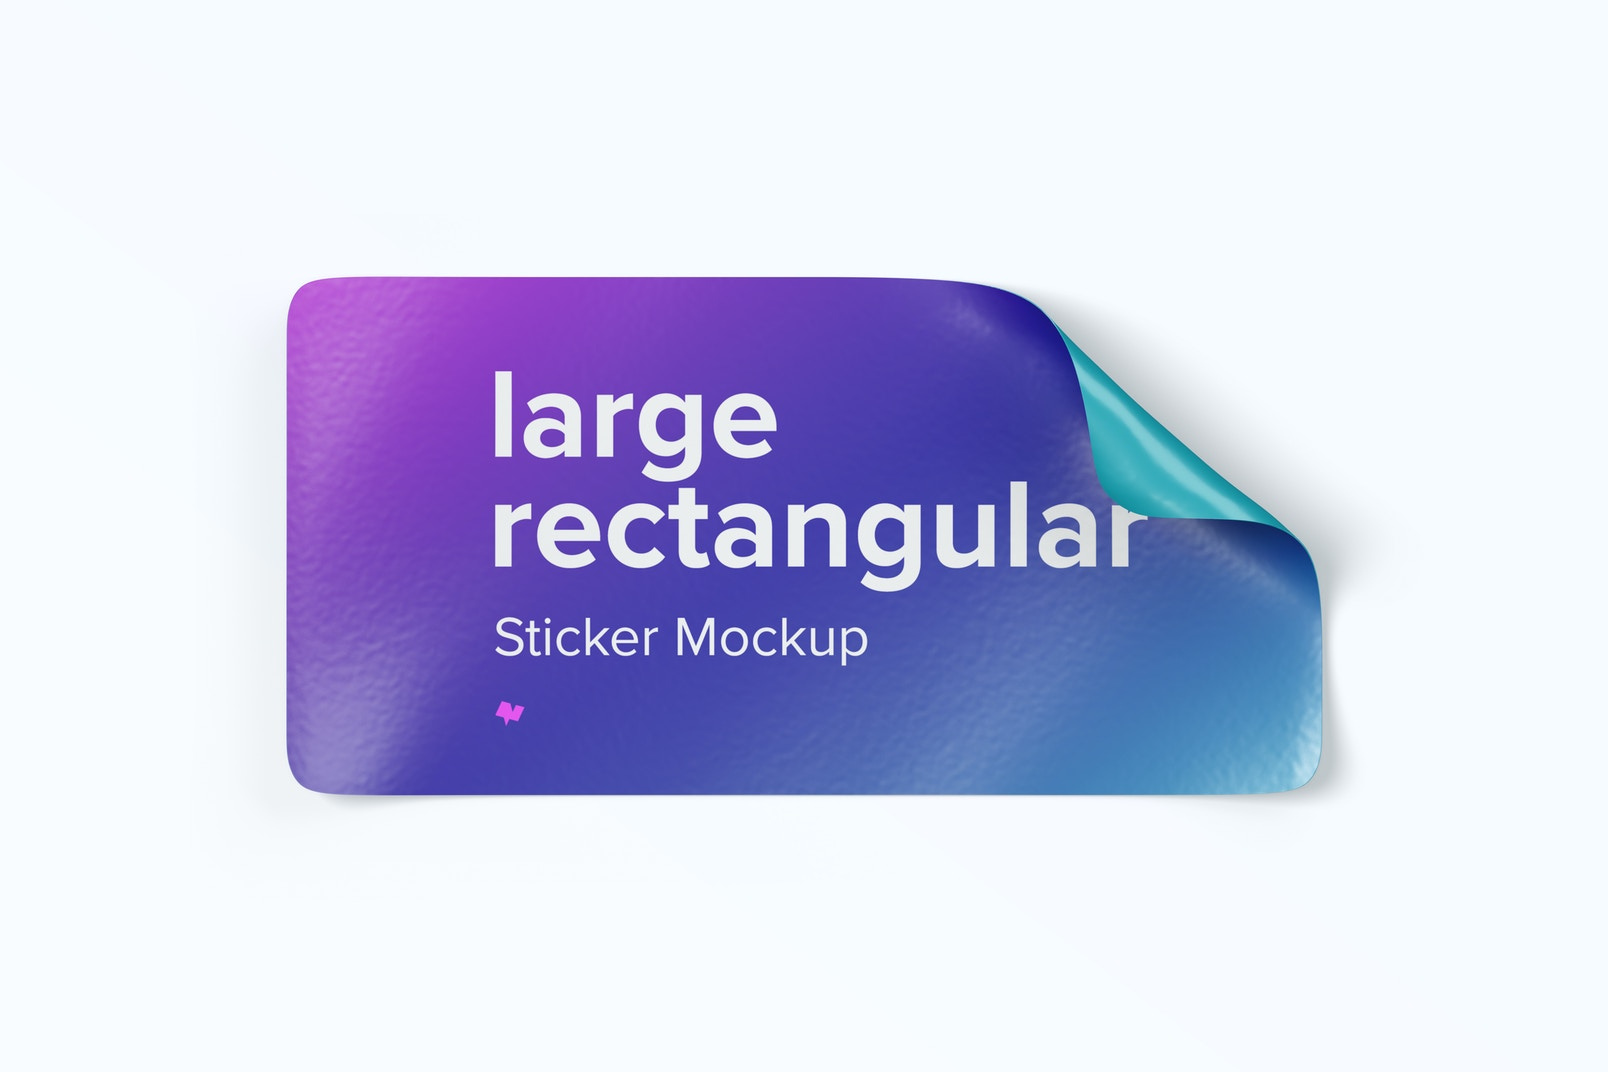 Large Rectangular Sticker Mockup, Top View 02